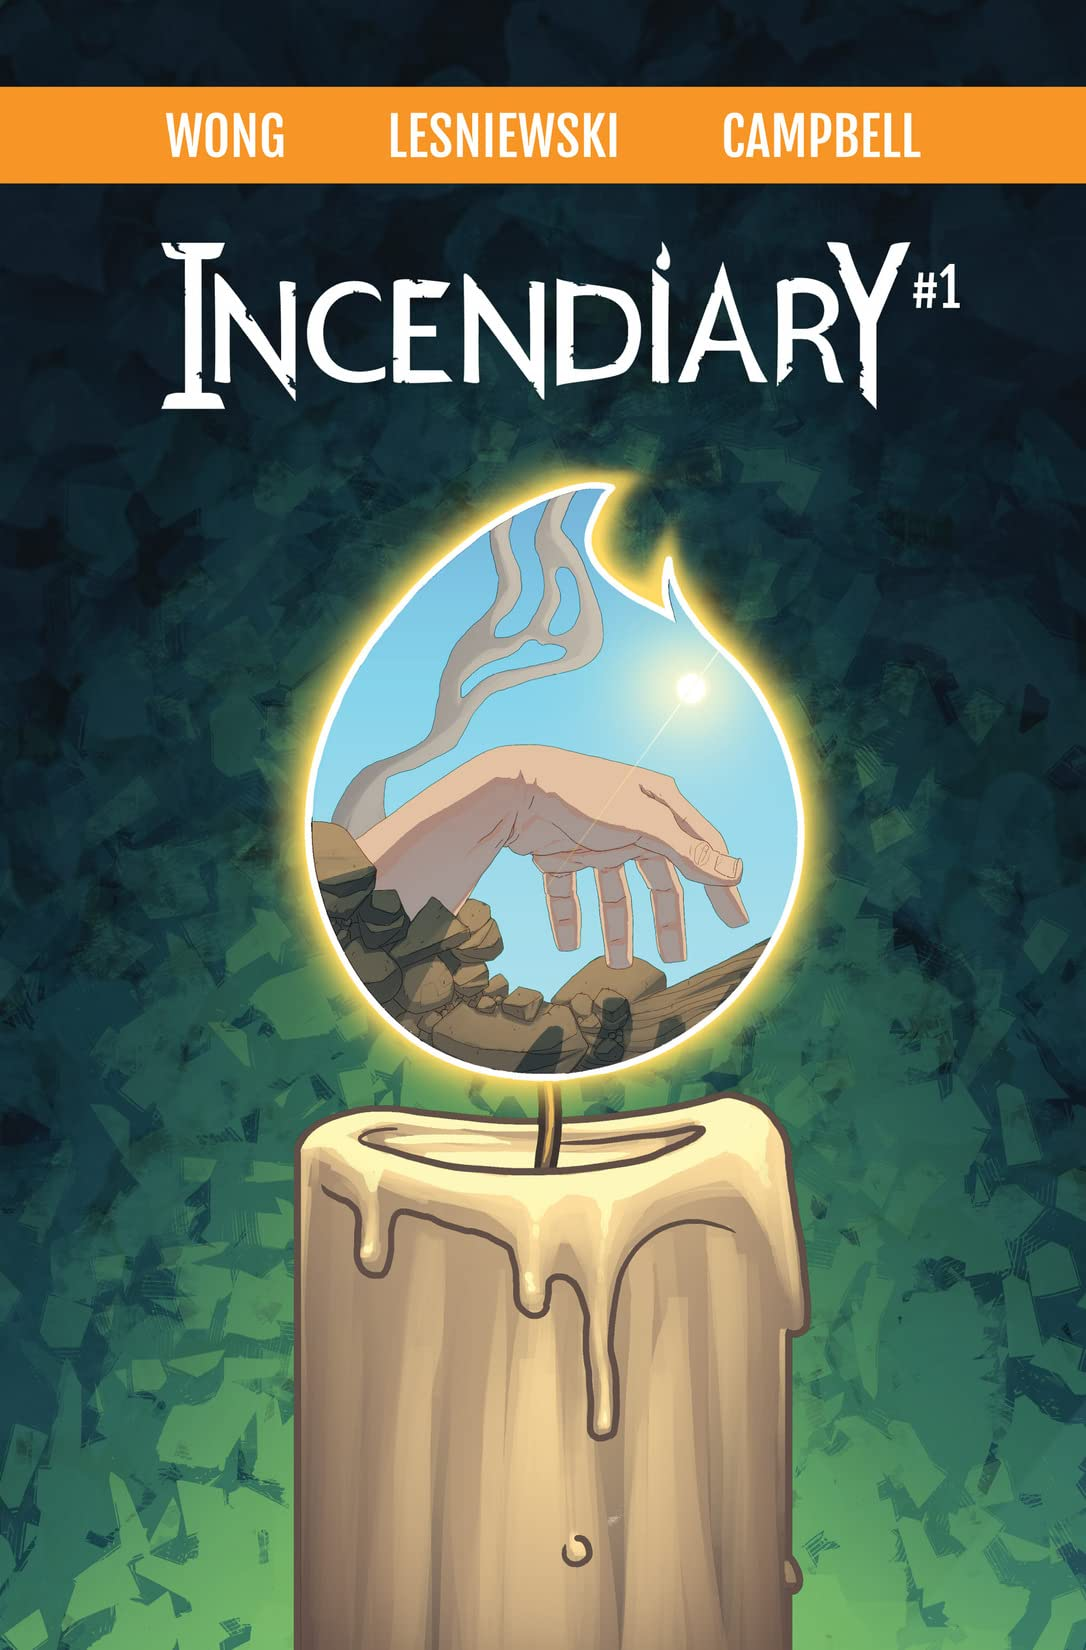 Incendiary #1